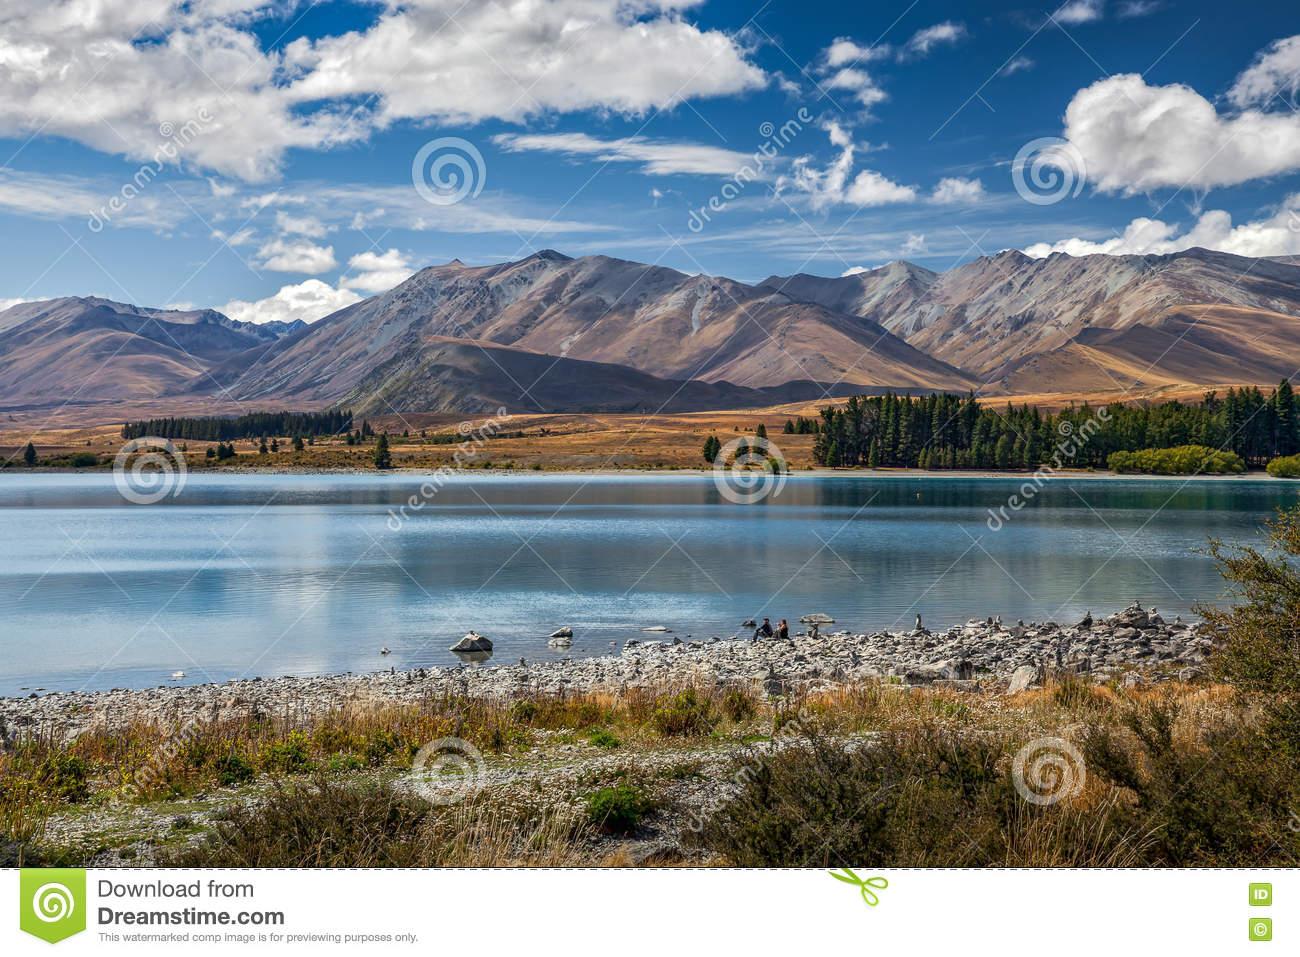 LAKE TEKAPO, MACKENZIE COUNTRY/NEW ZEALAND.